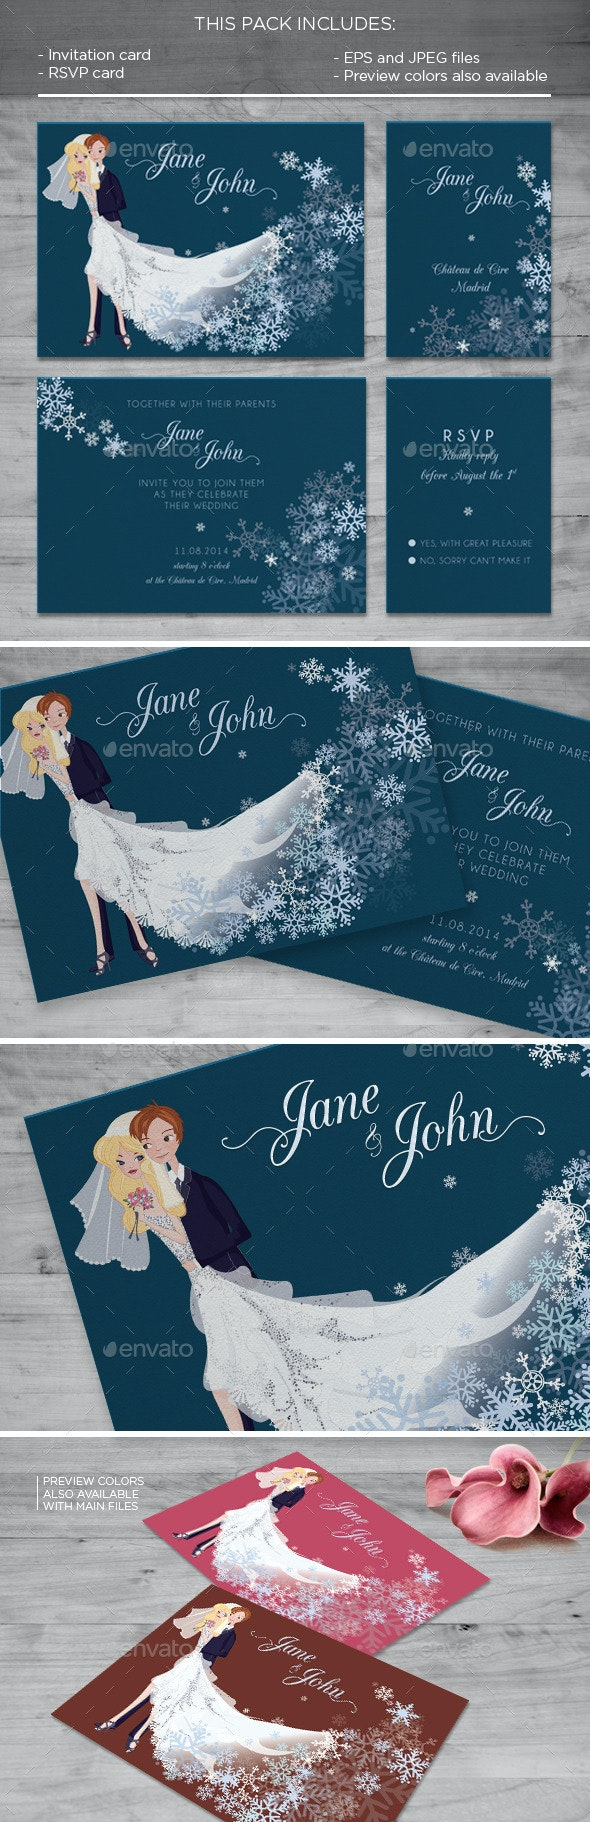 Snow Flake Invitation Card - Weddings Cards & Invites